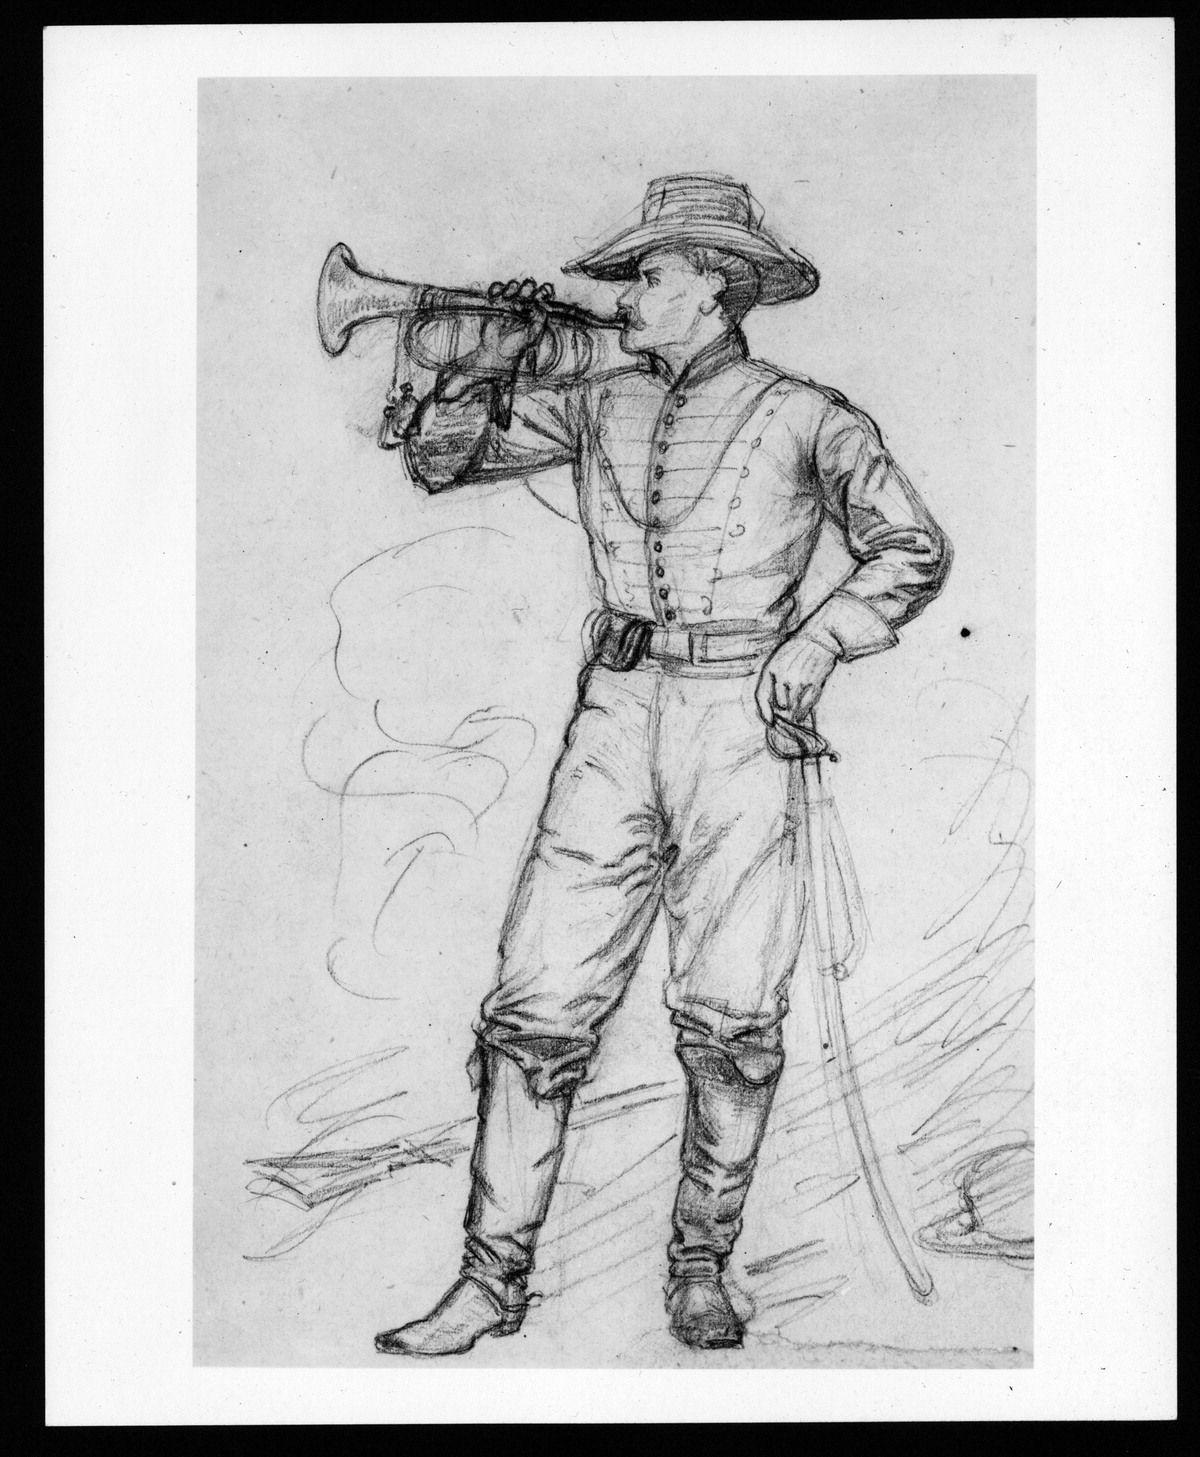 american civil war soldiers drawing pencil drawing war between